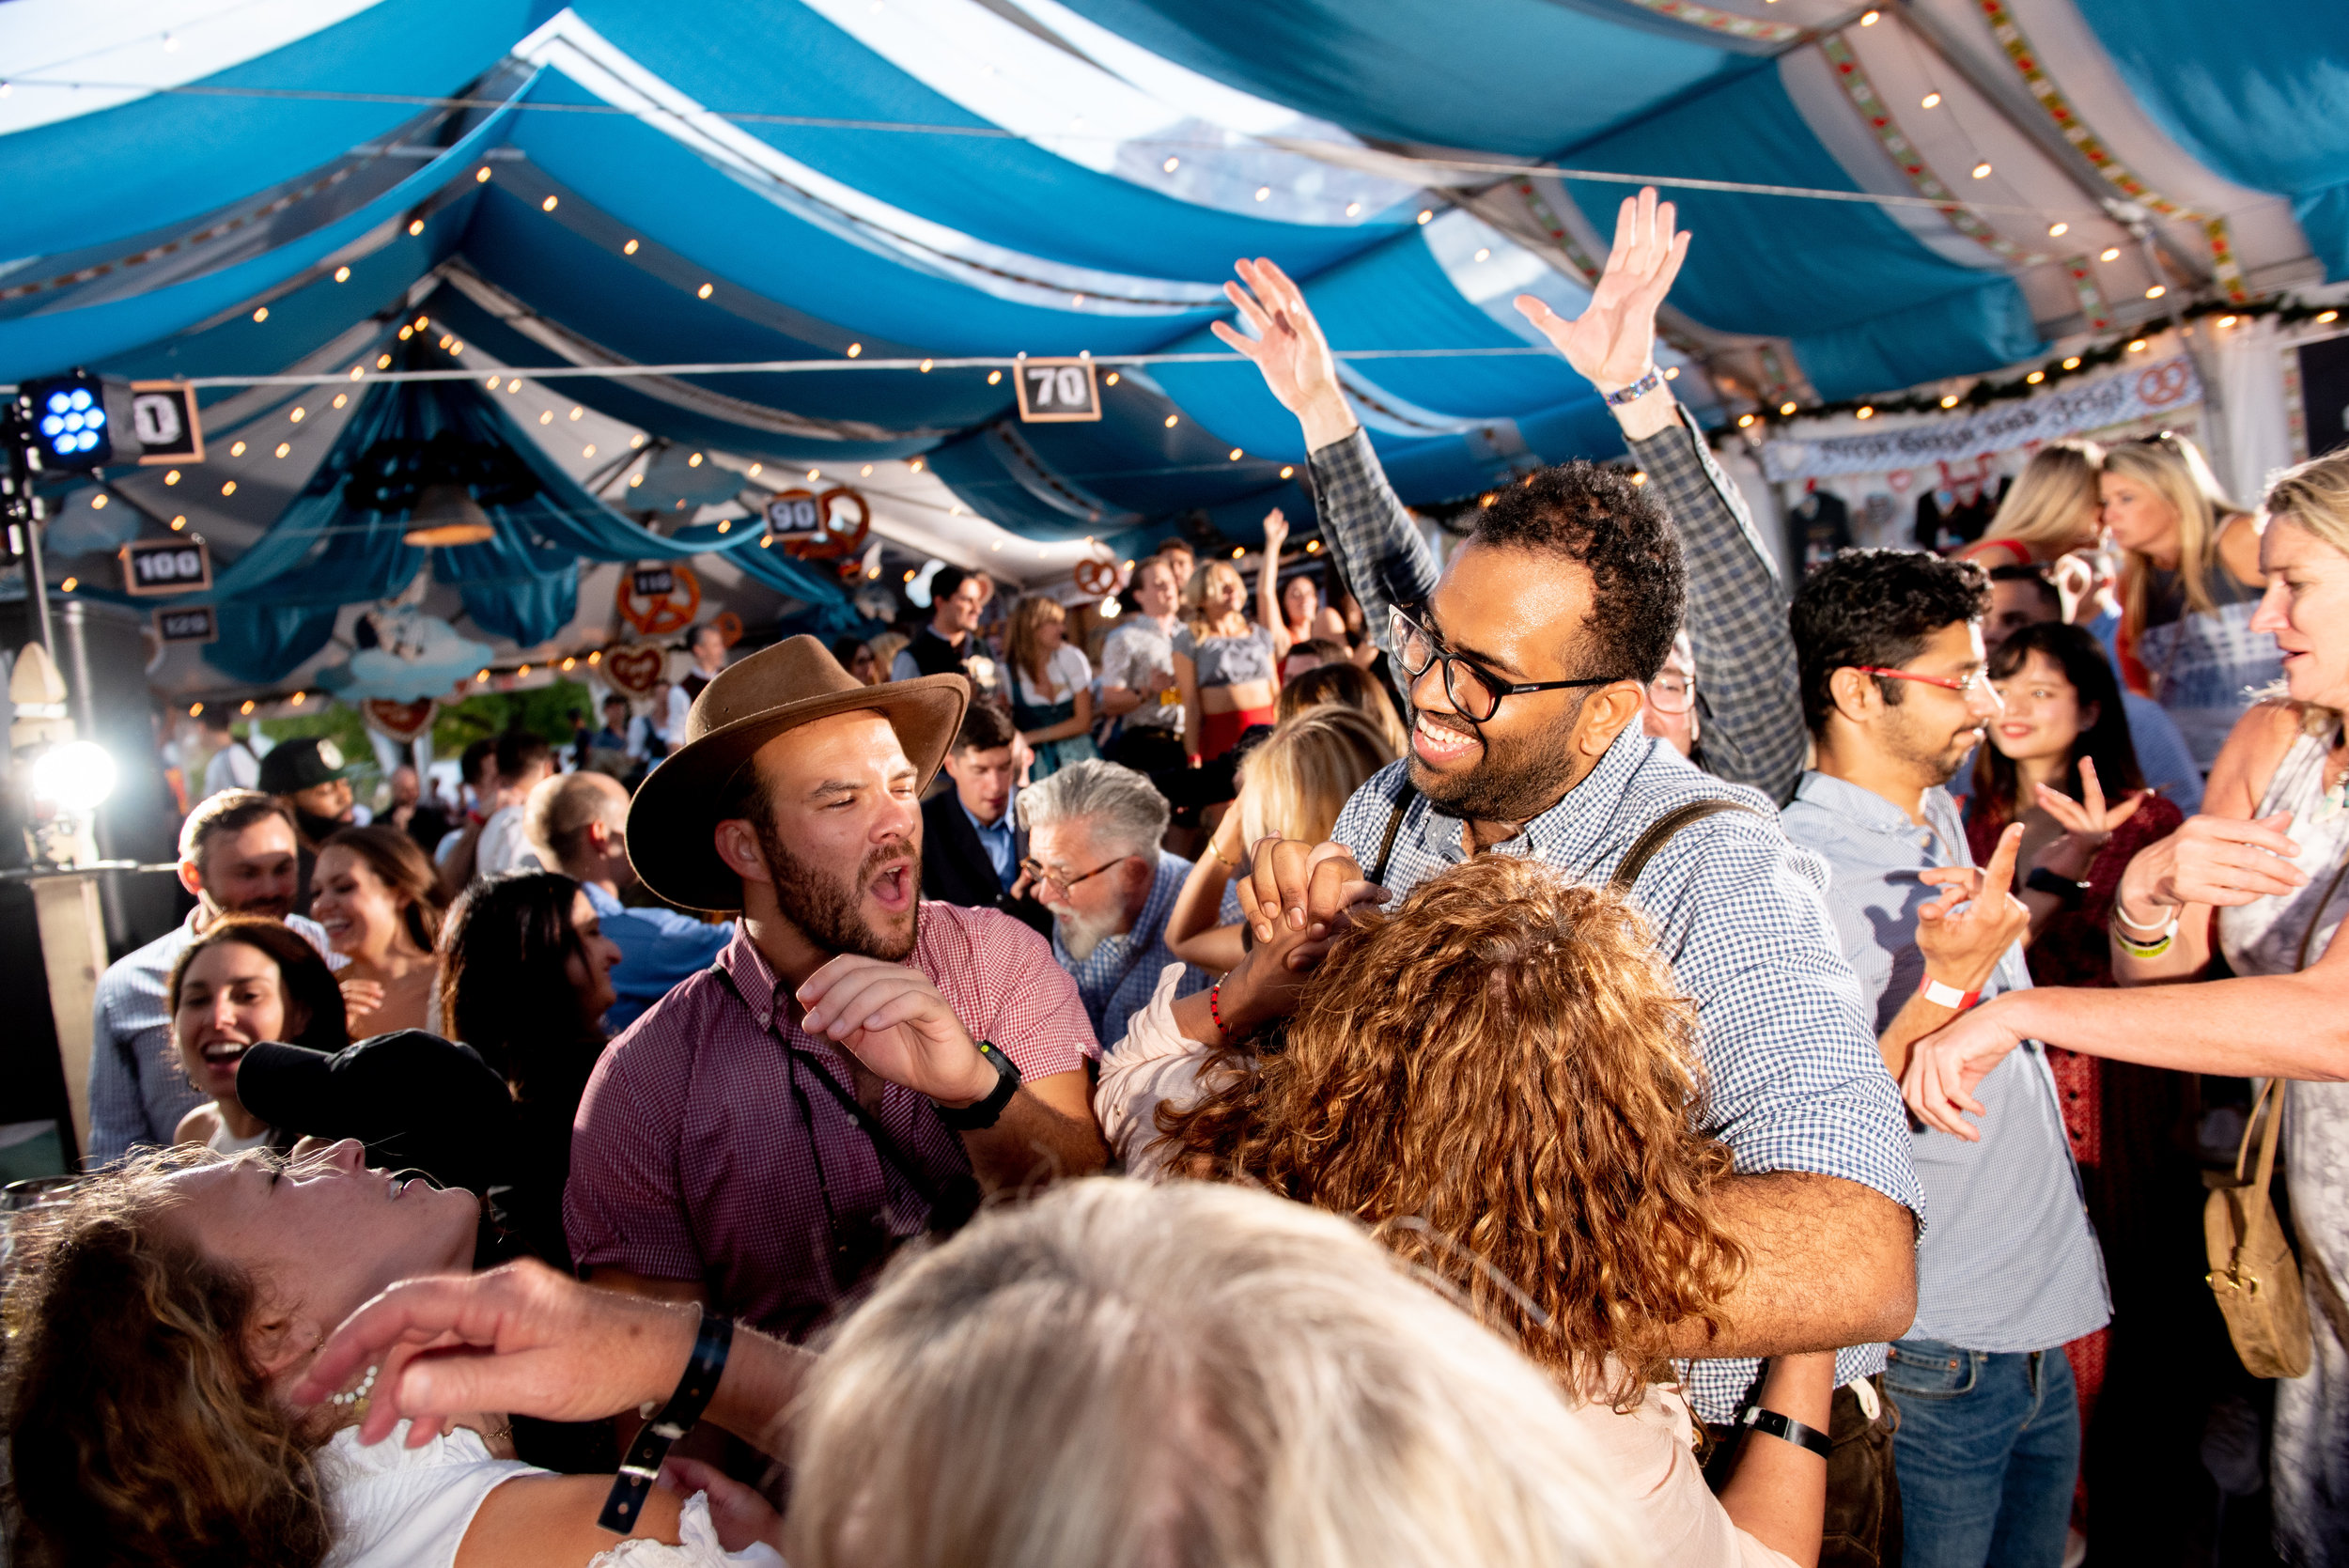 jonathan-mcphail-photography-brooklyn-new-york-nyc-event-events-photographer-5011.jpg